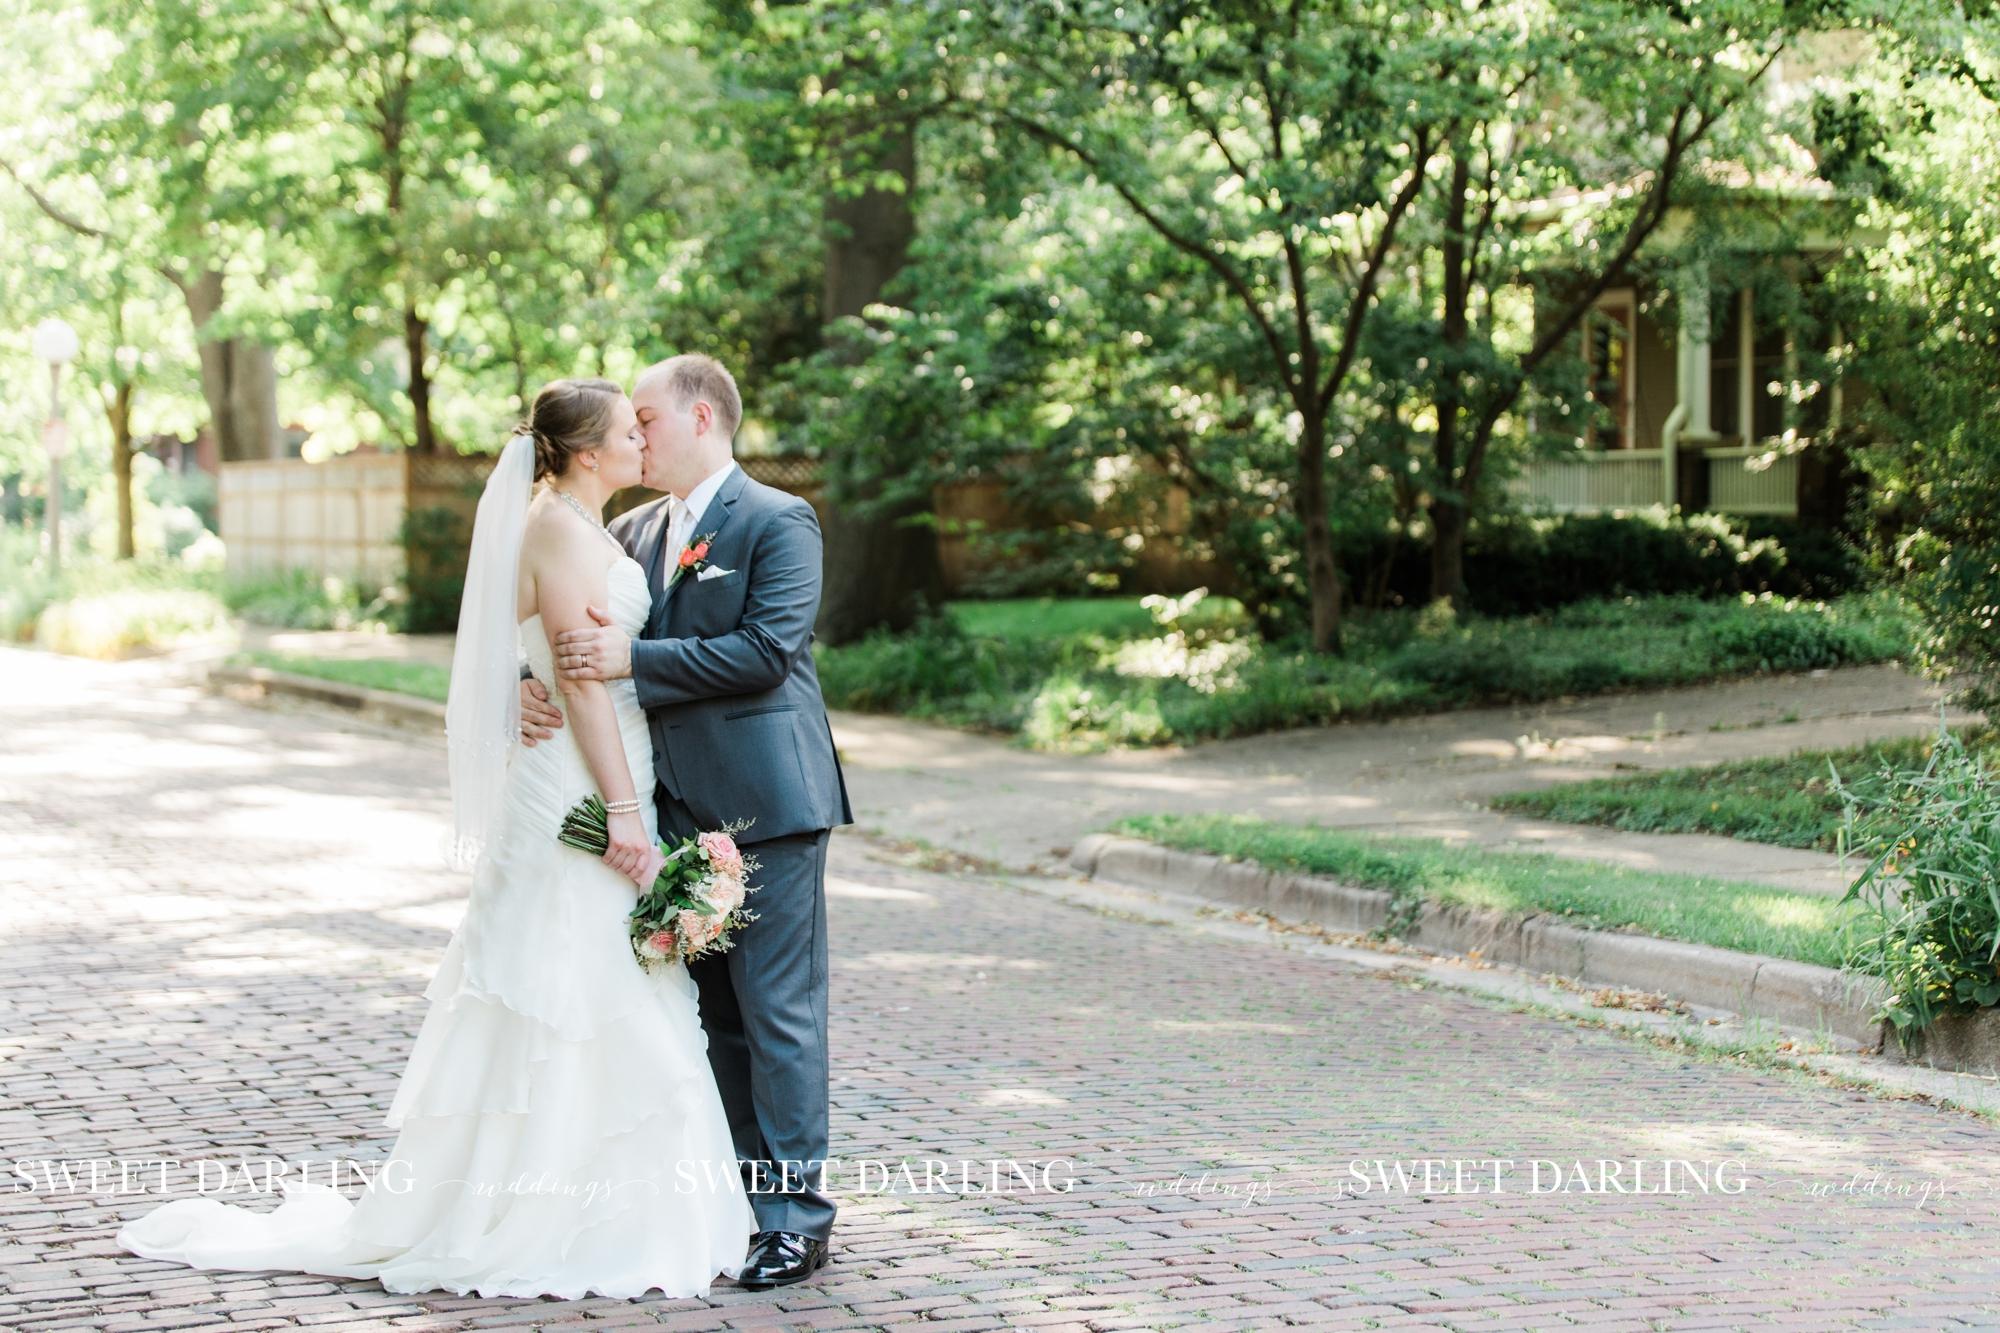 Holy-Cross-Catholic-Wedding-Photography-Champaign-County-IL-Sweet-Darling_1531.jpg